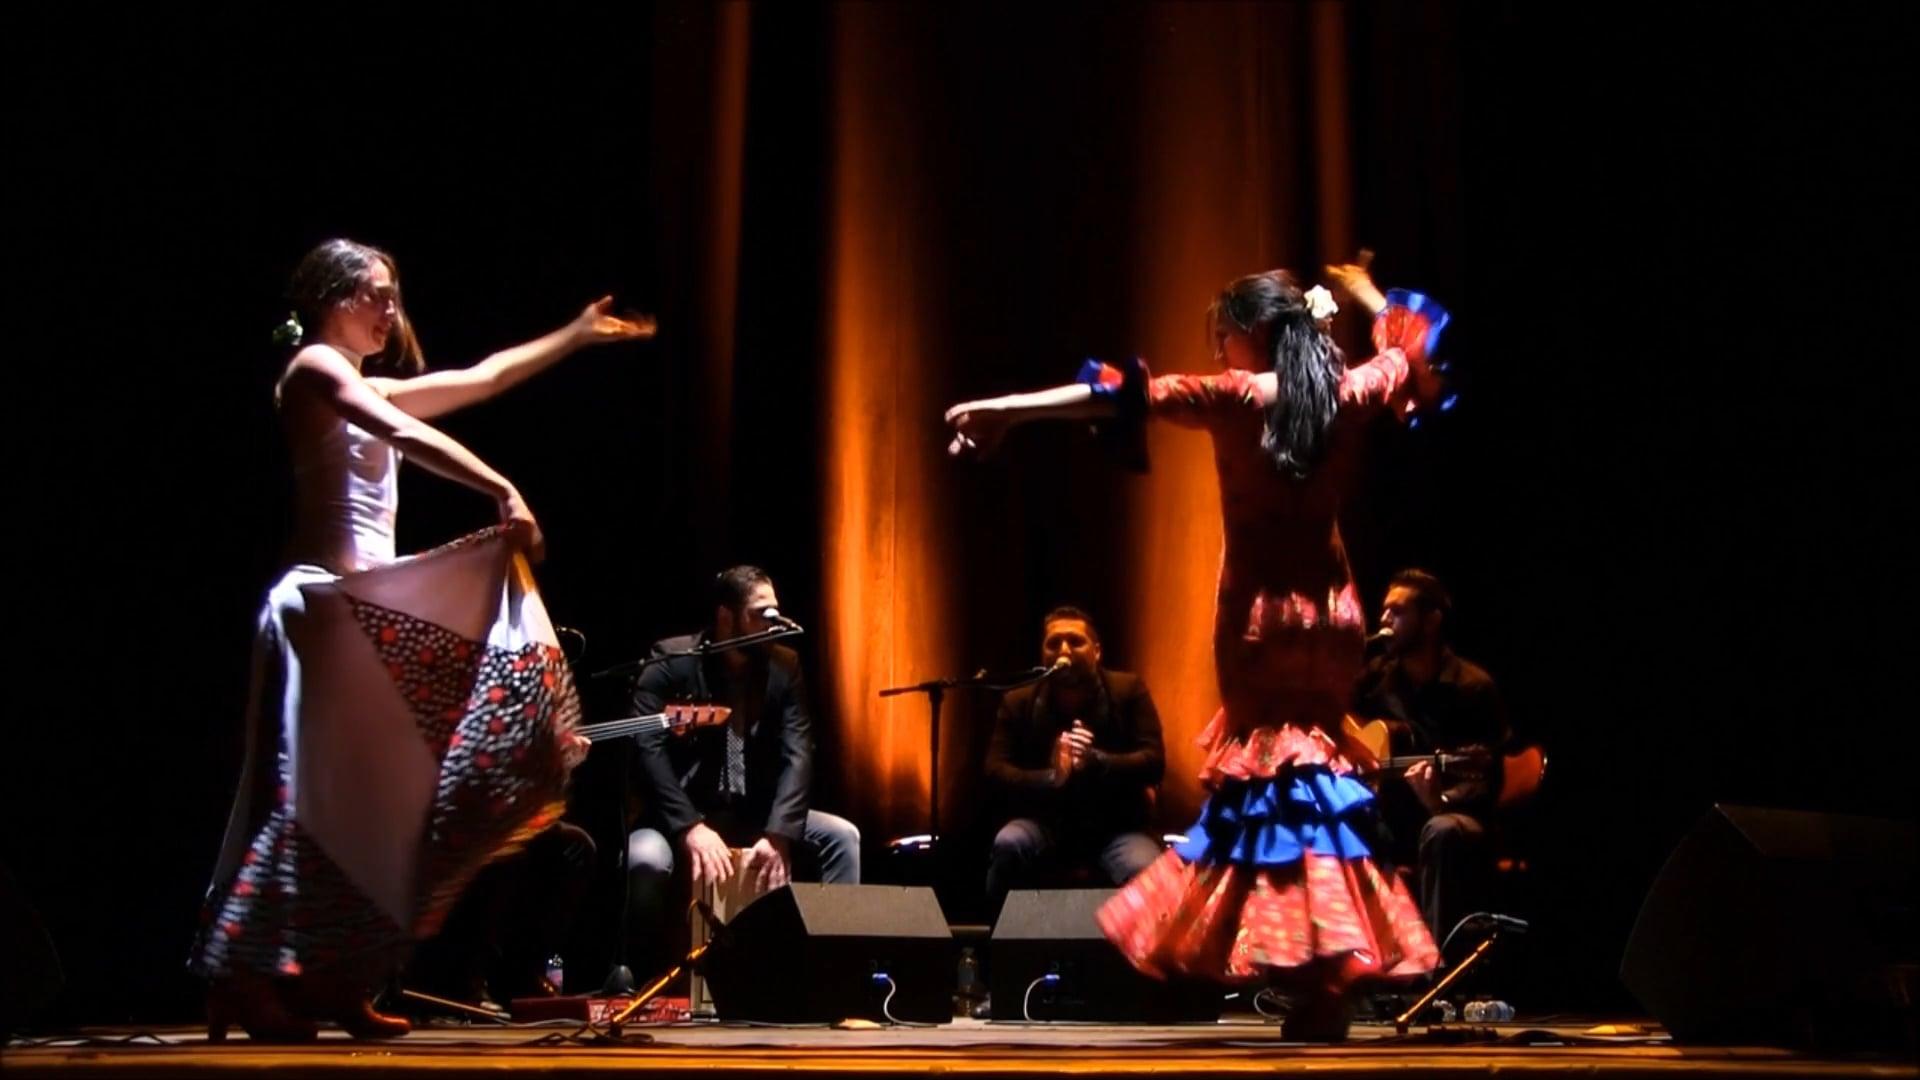 Fiesta Flamenca l Julianna Ymira & Cie